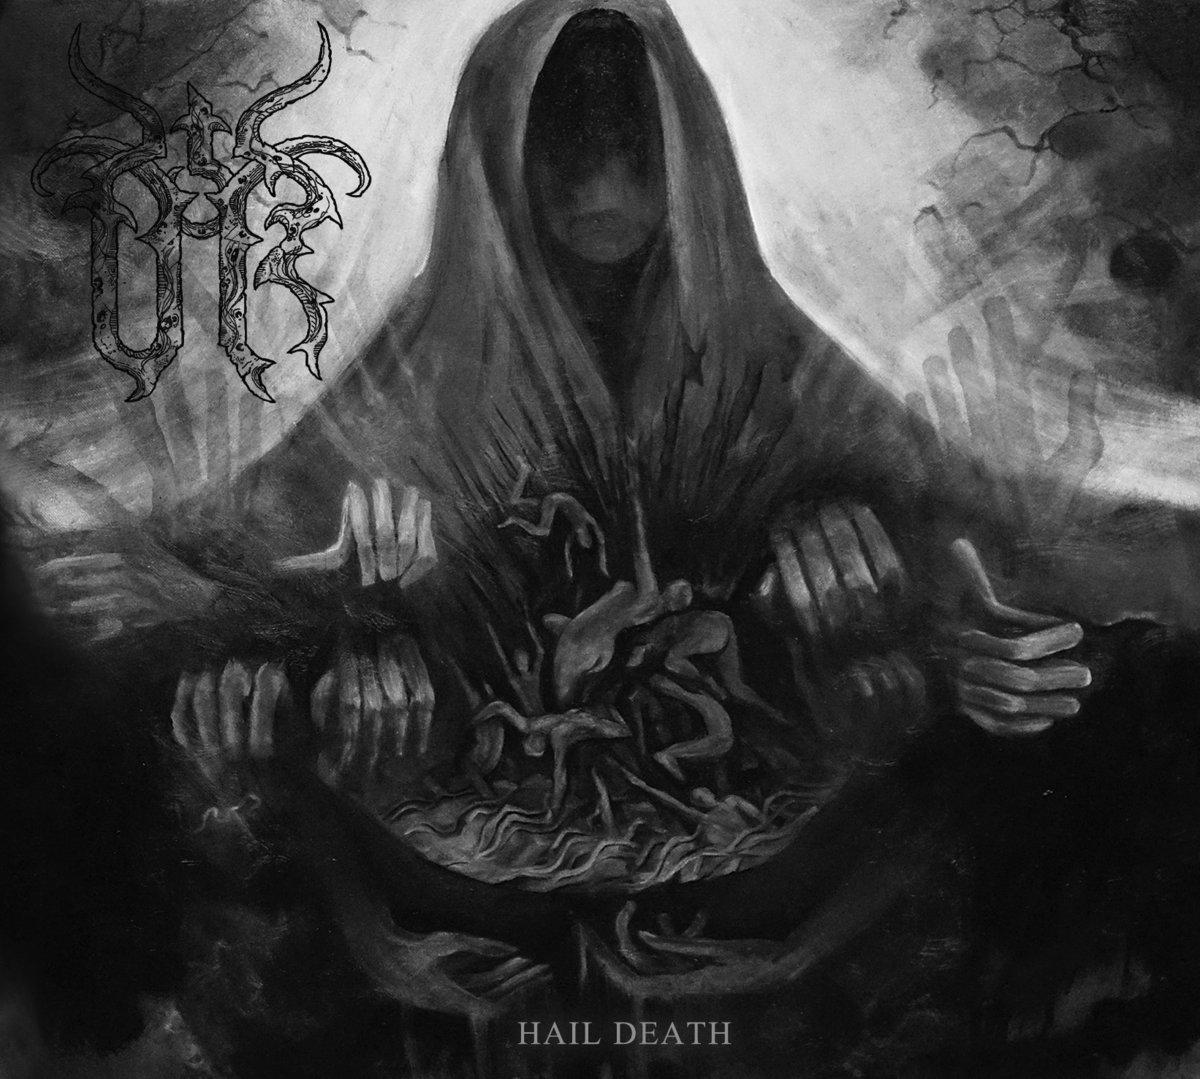 hail death ur